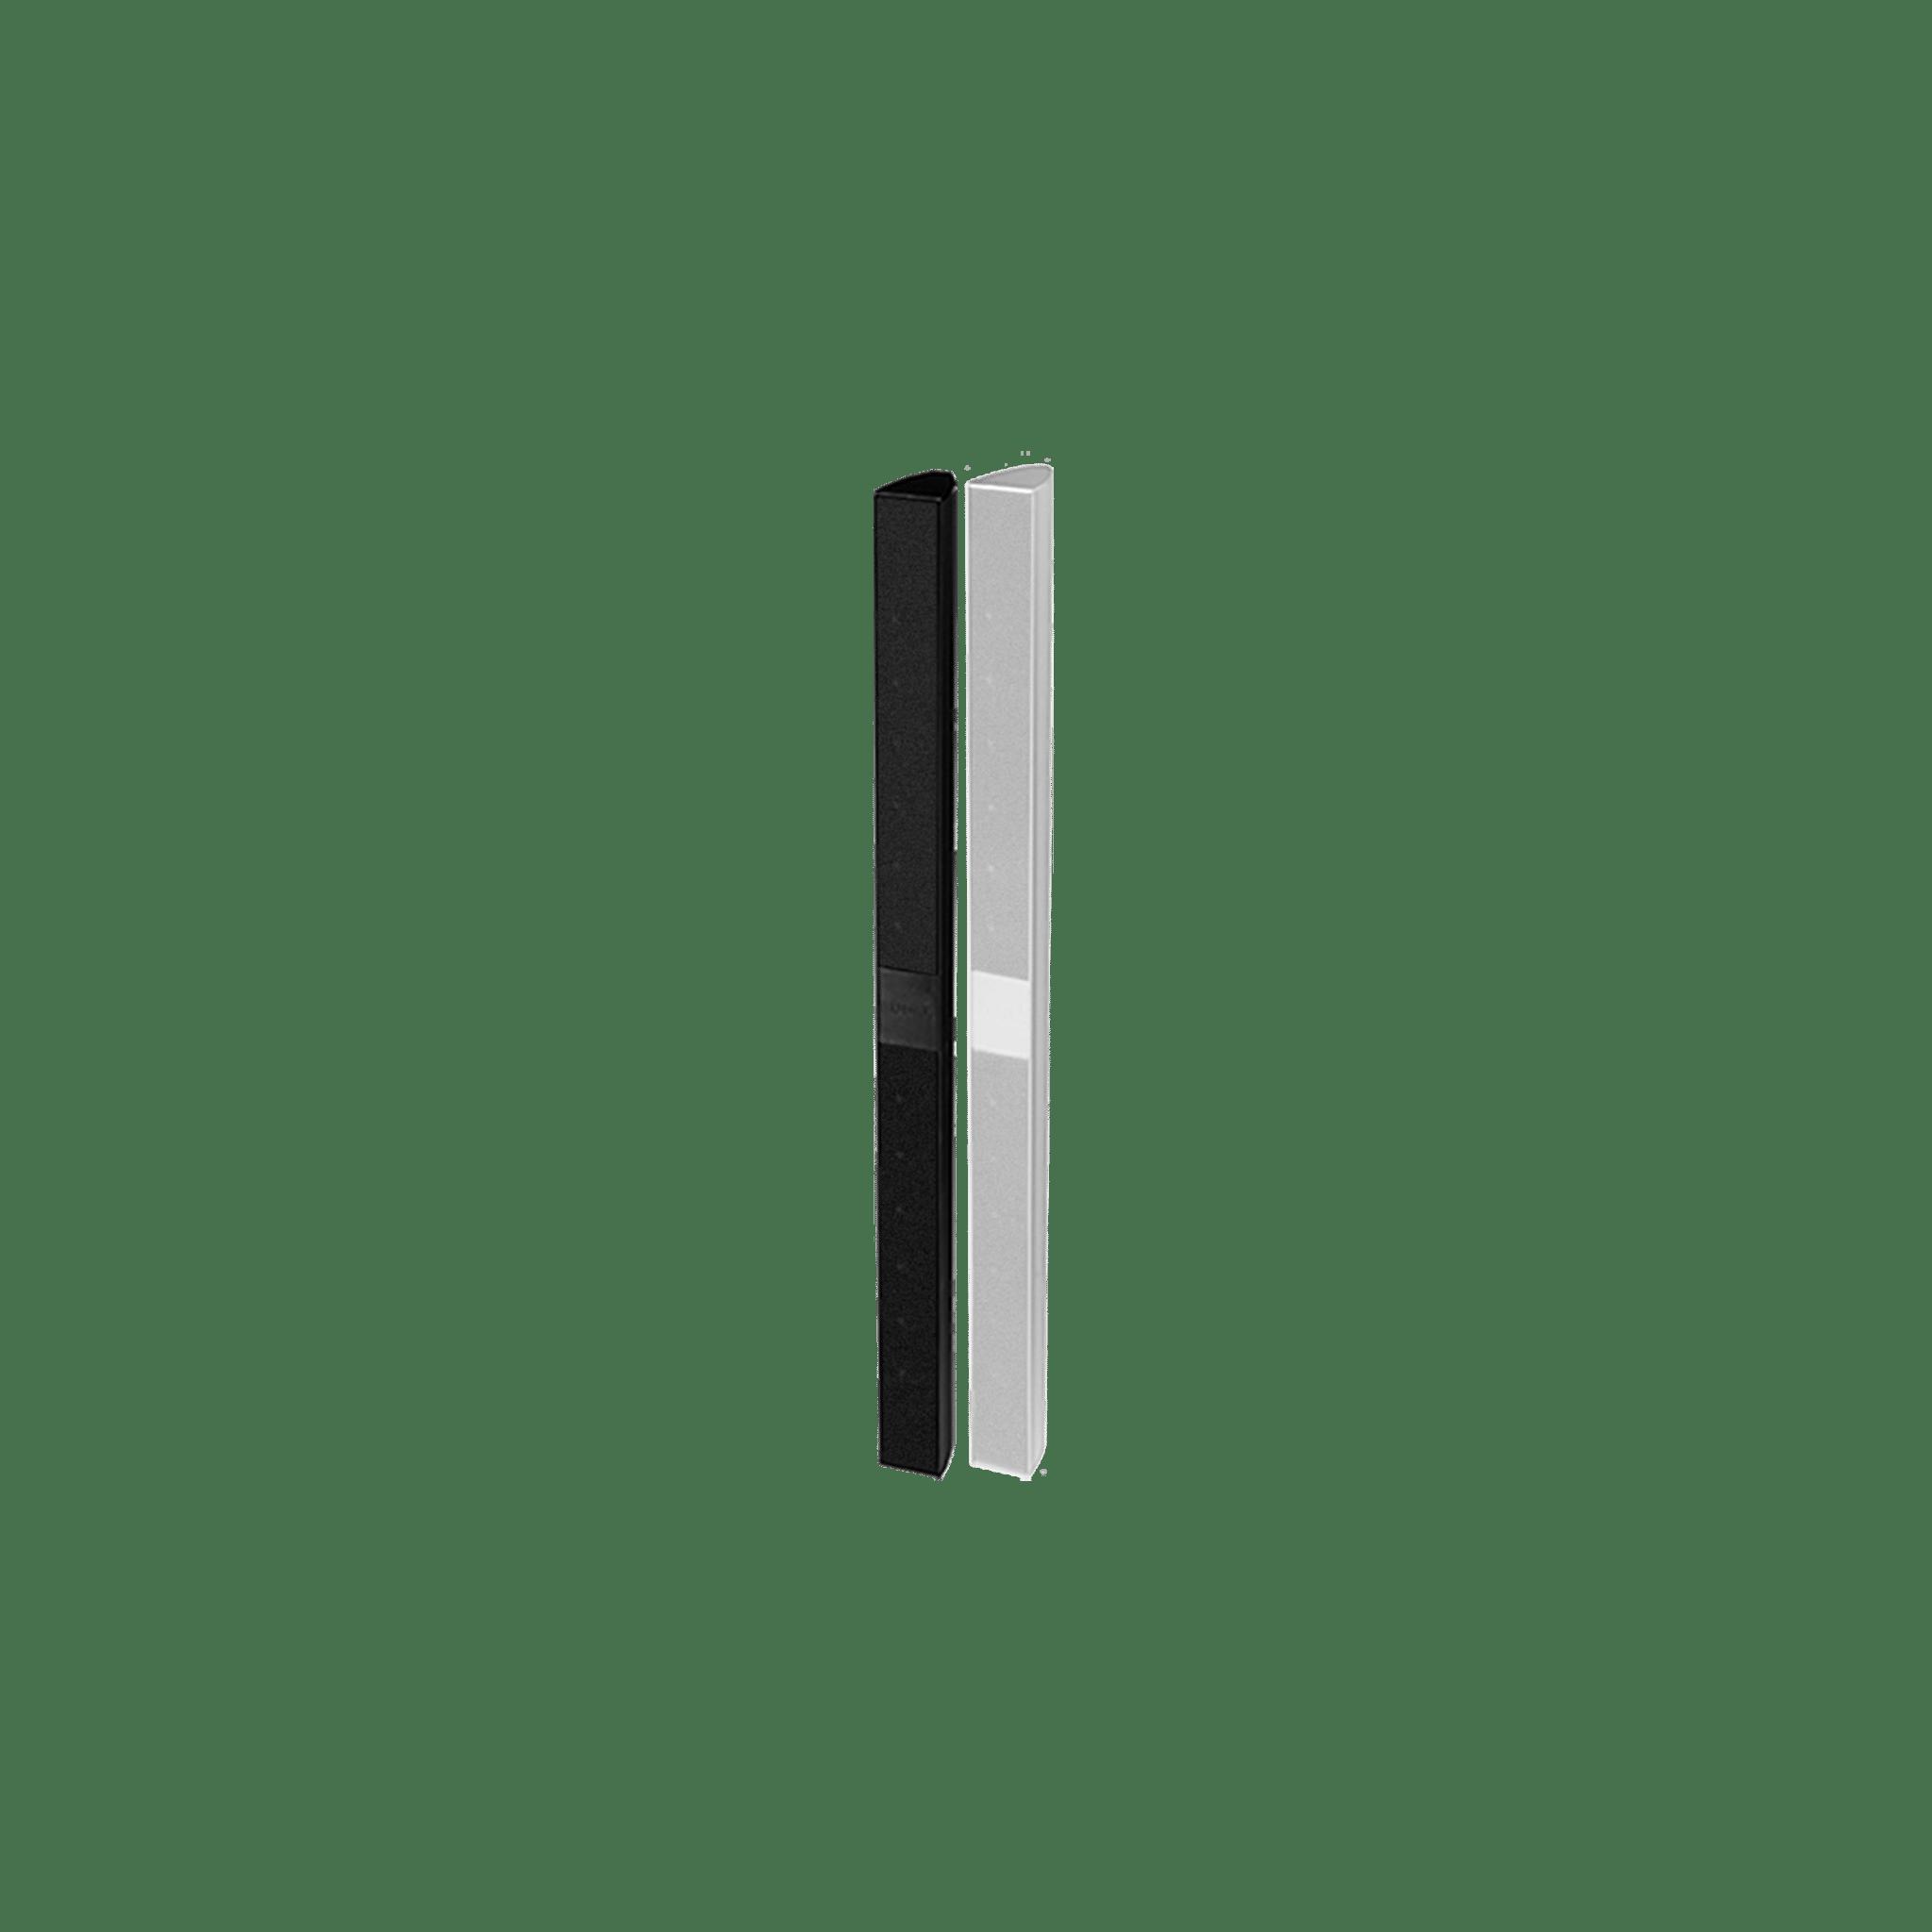 "AXIR_O - Outdoor design column speaker 12 x 2"""